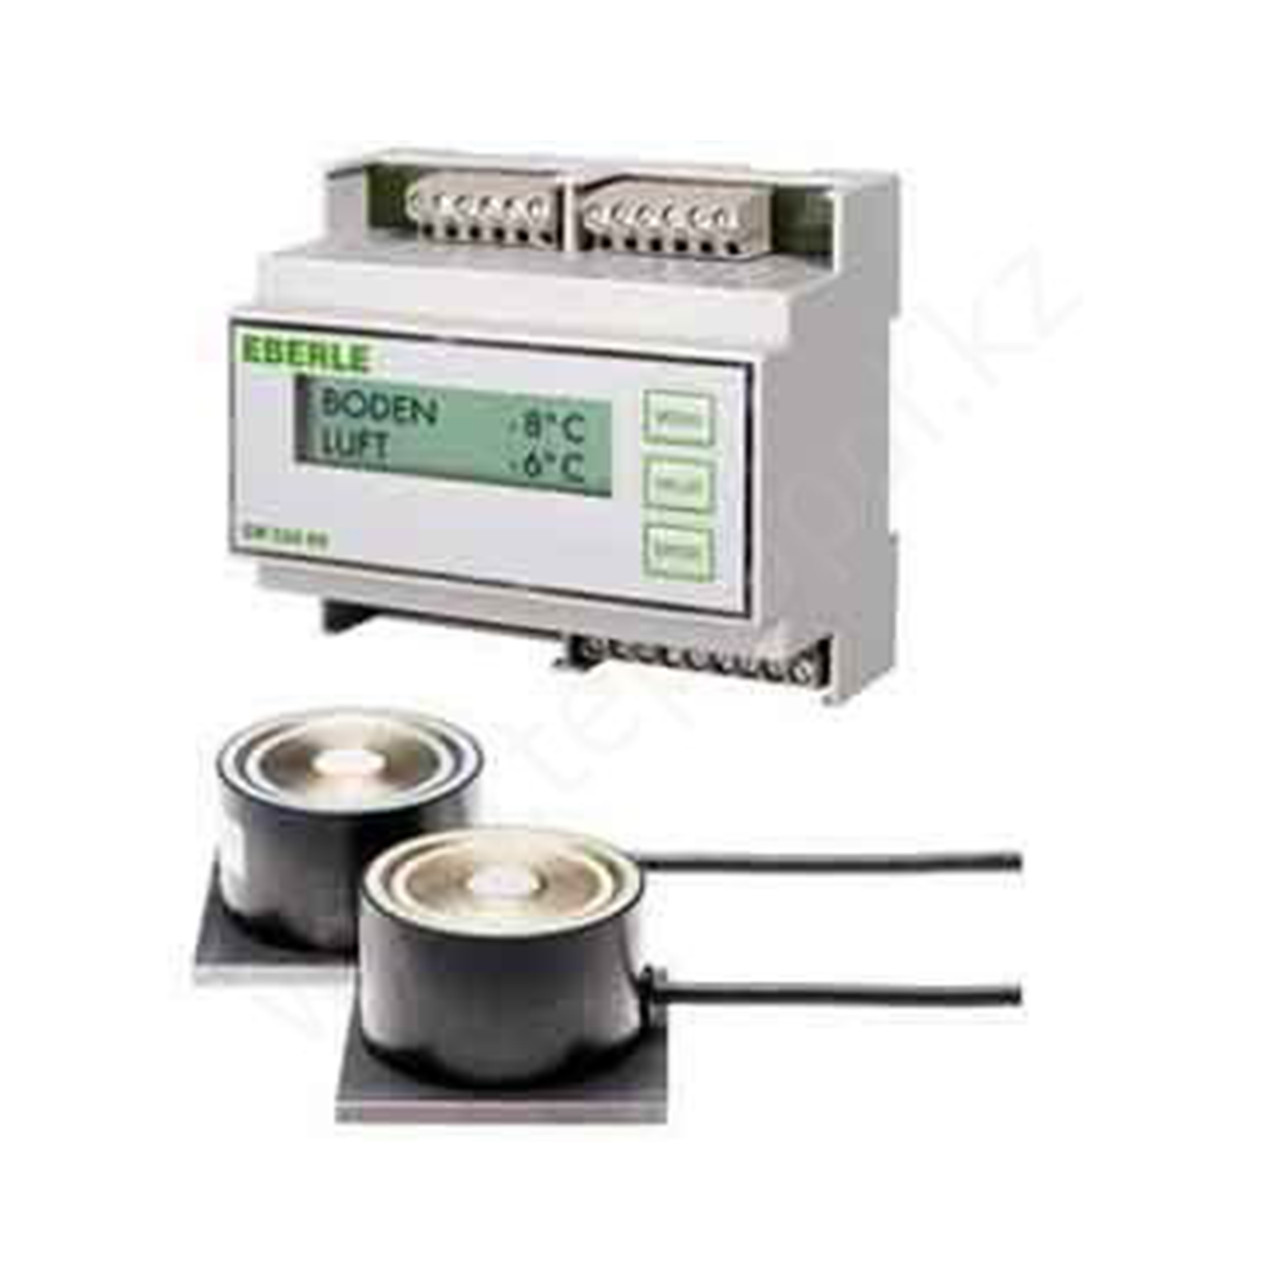 Терморегулятор EBERLE EM 524 89 ESD 001 и TFD 002